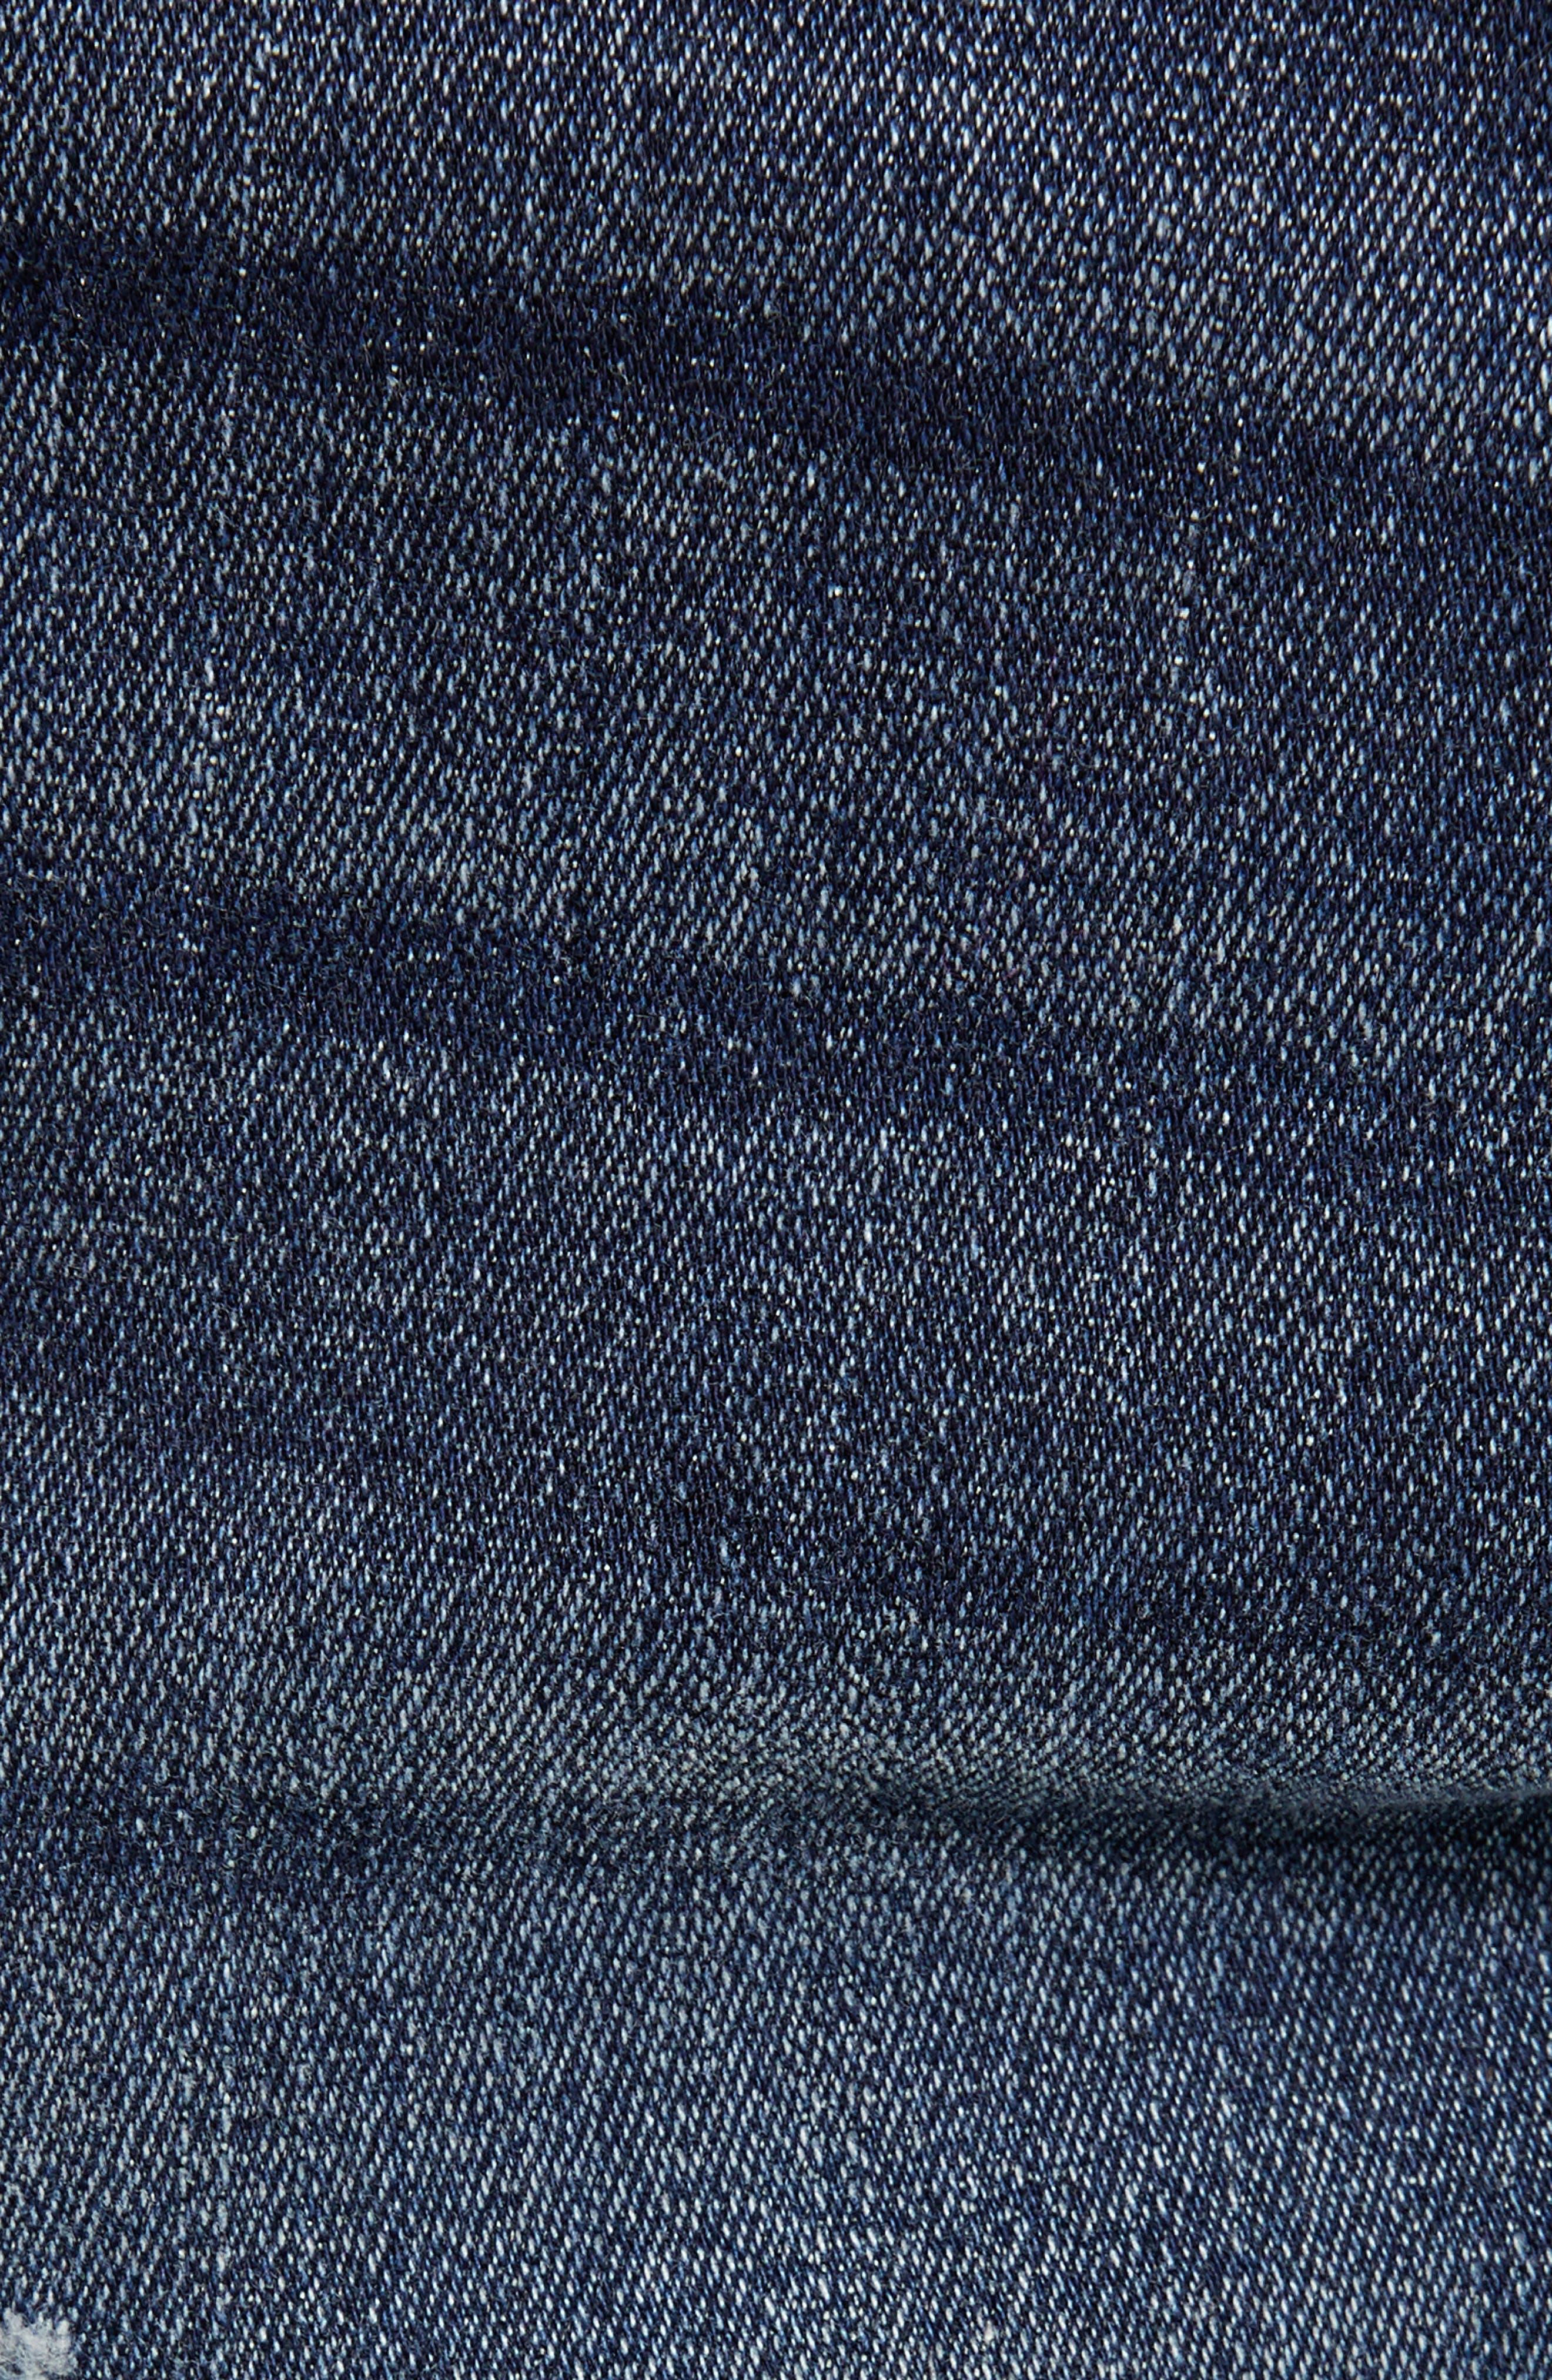 Rocco Skinny Fit Moto Jeans,                             Alternate thumbnail 5, color,                             MINERAL ASPHALT